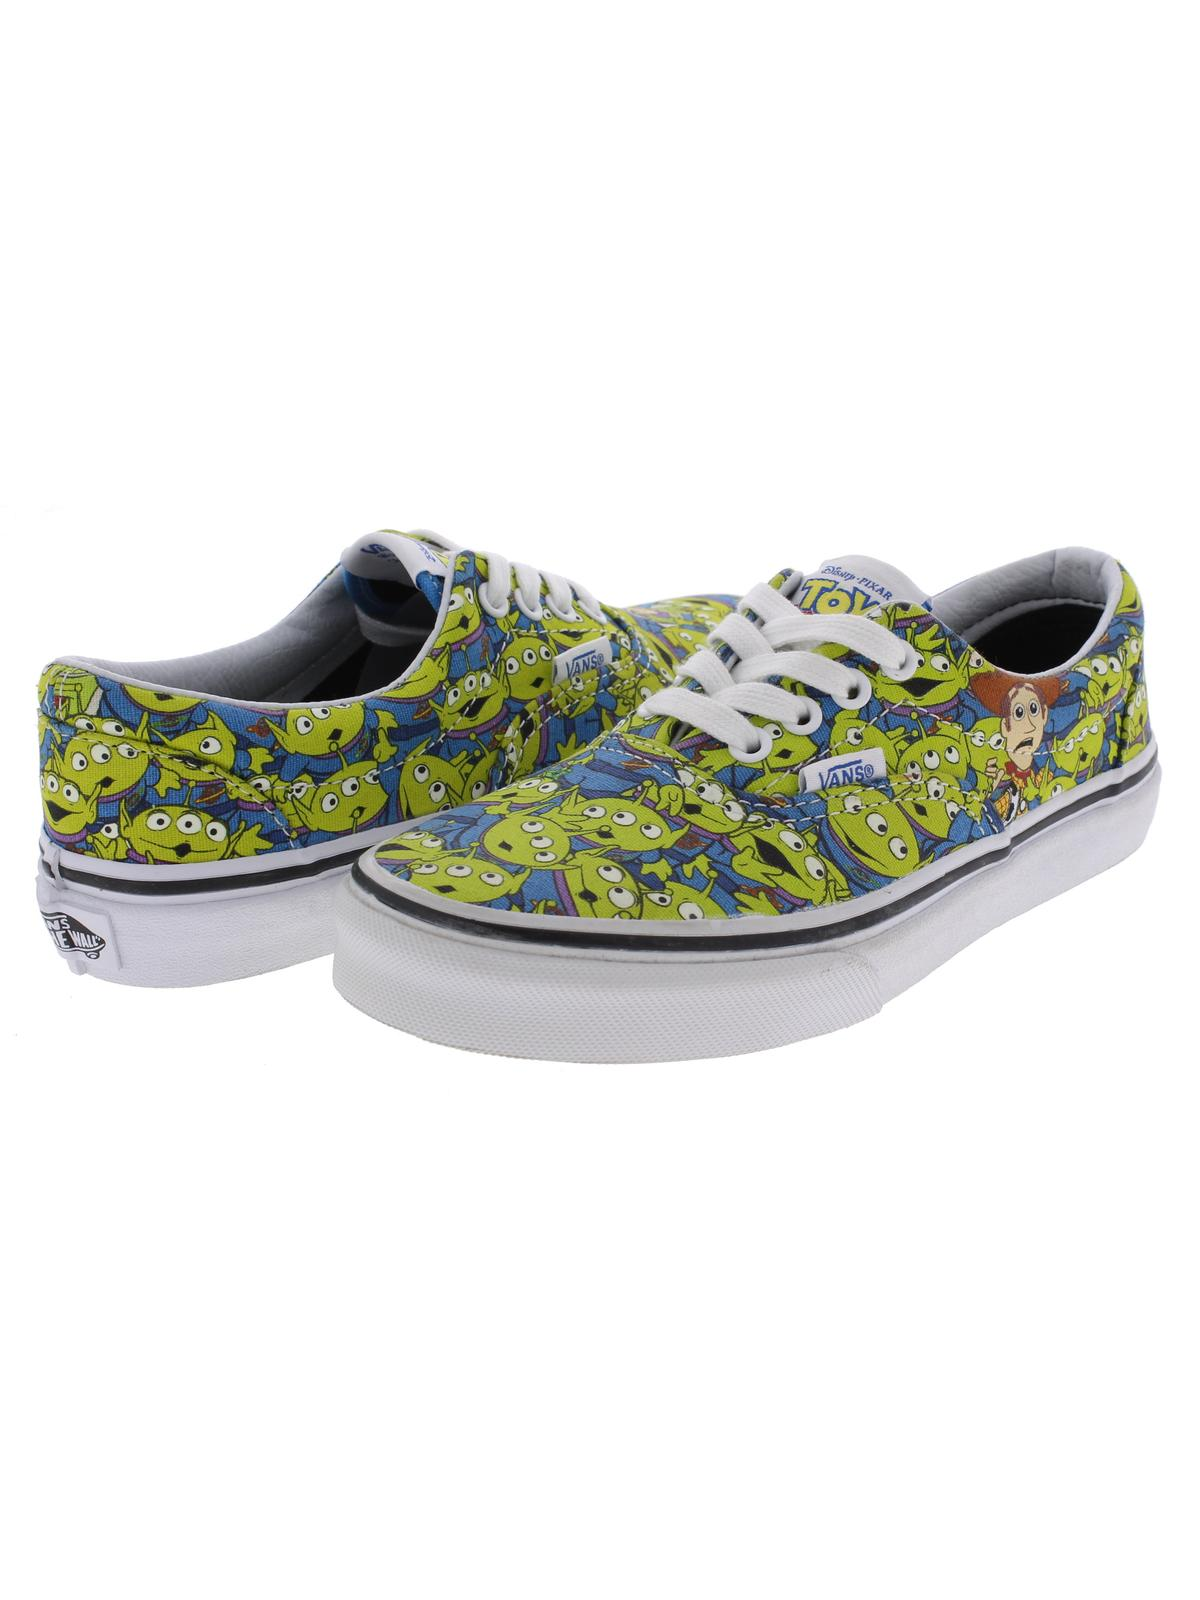 705f3b56be Vans - Vans Womens Era Toy Story Fashion Aliens Skateboarding Shoes -  Walmart.com